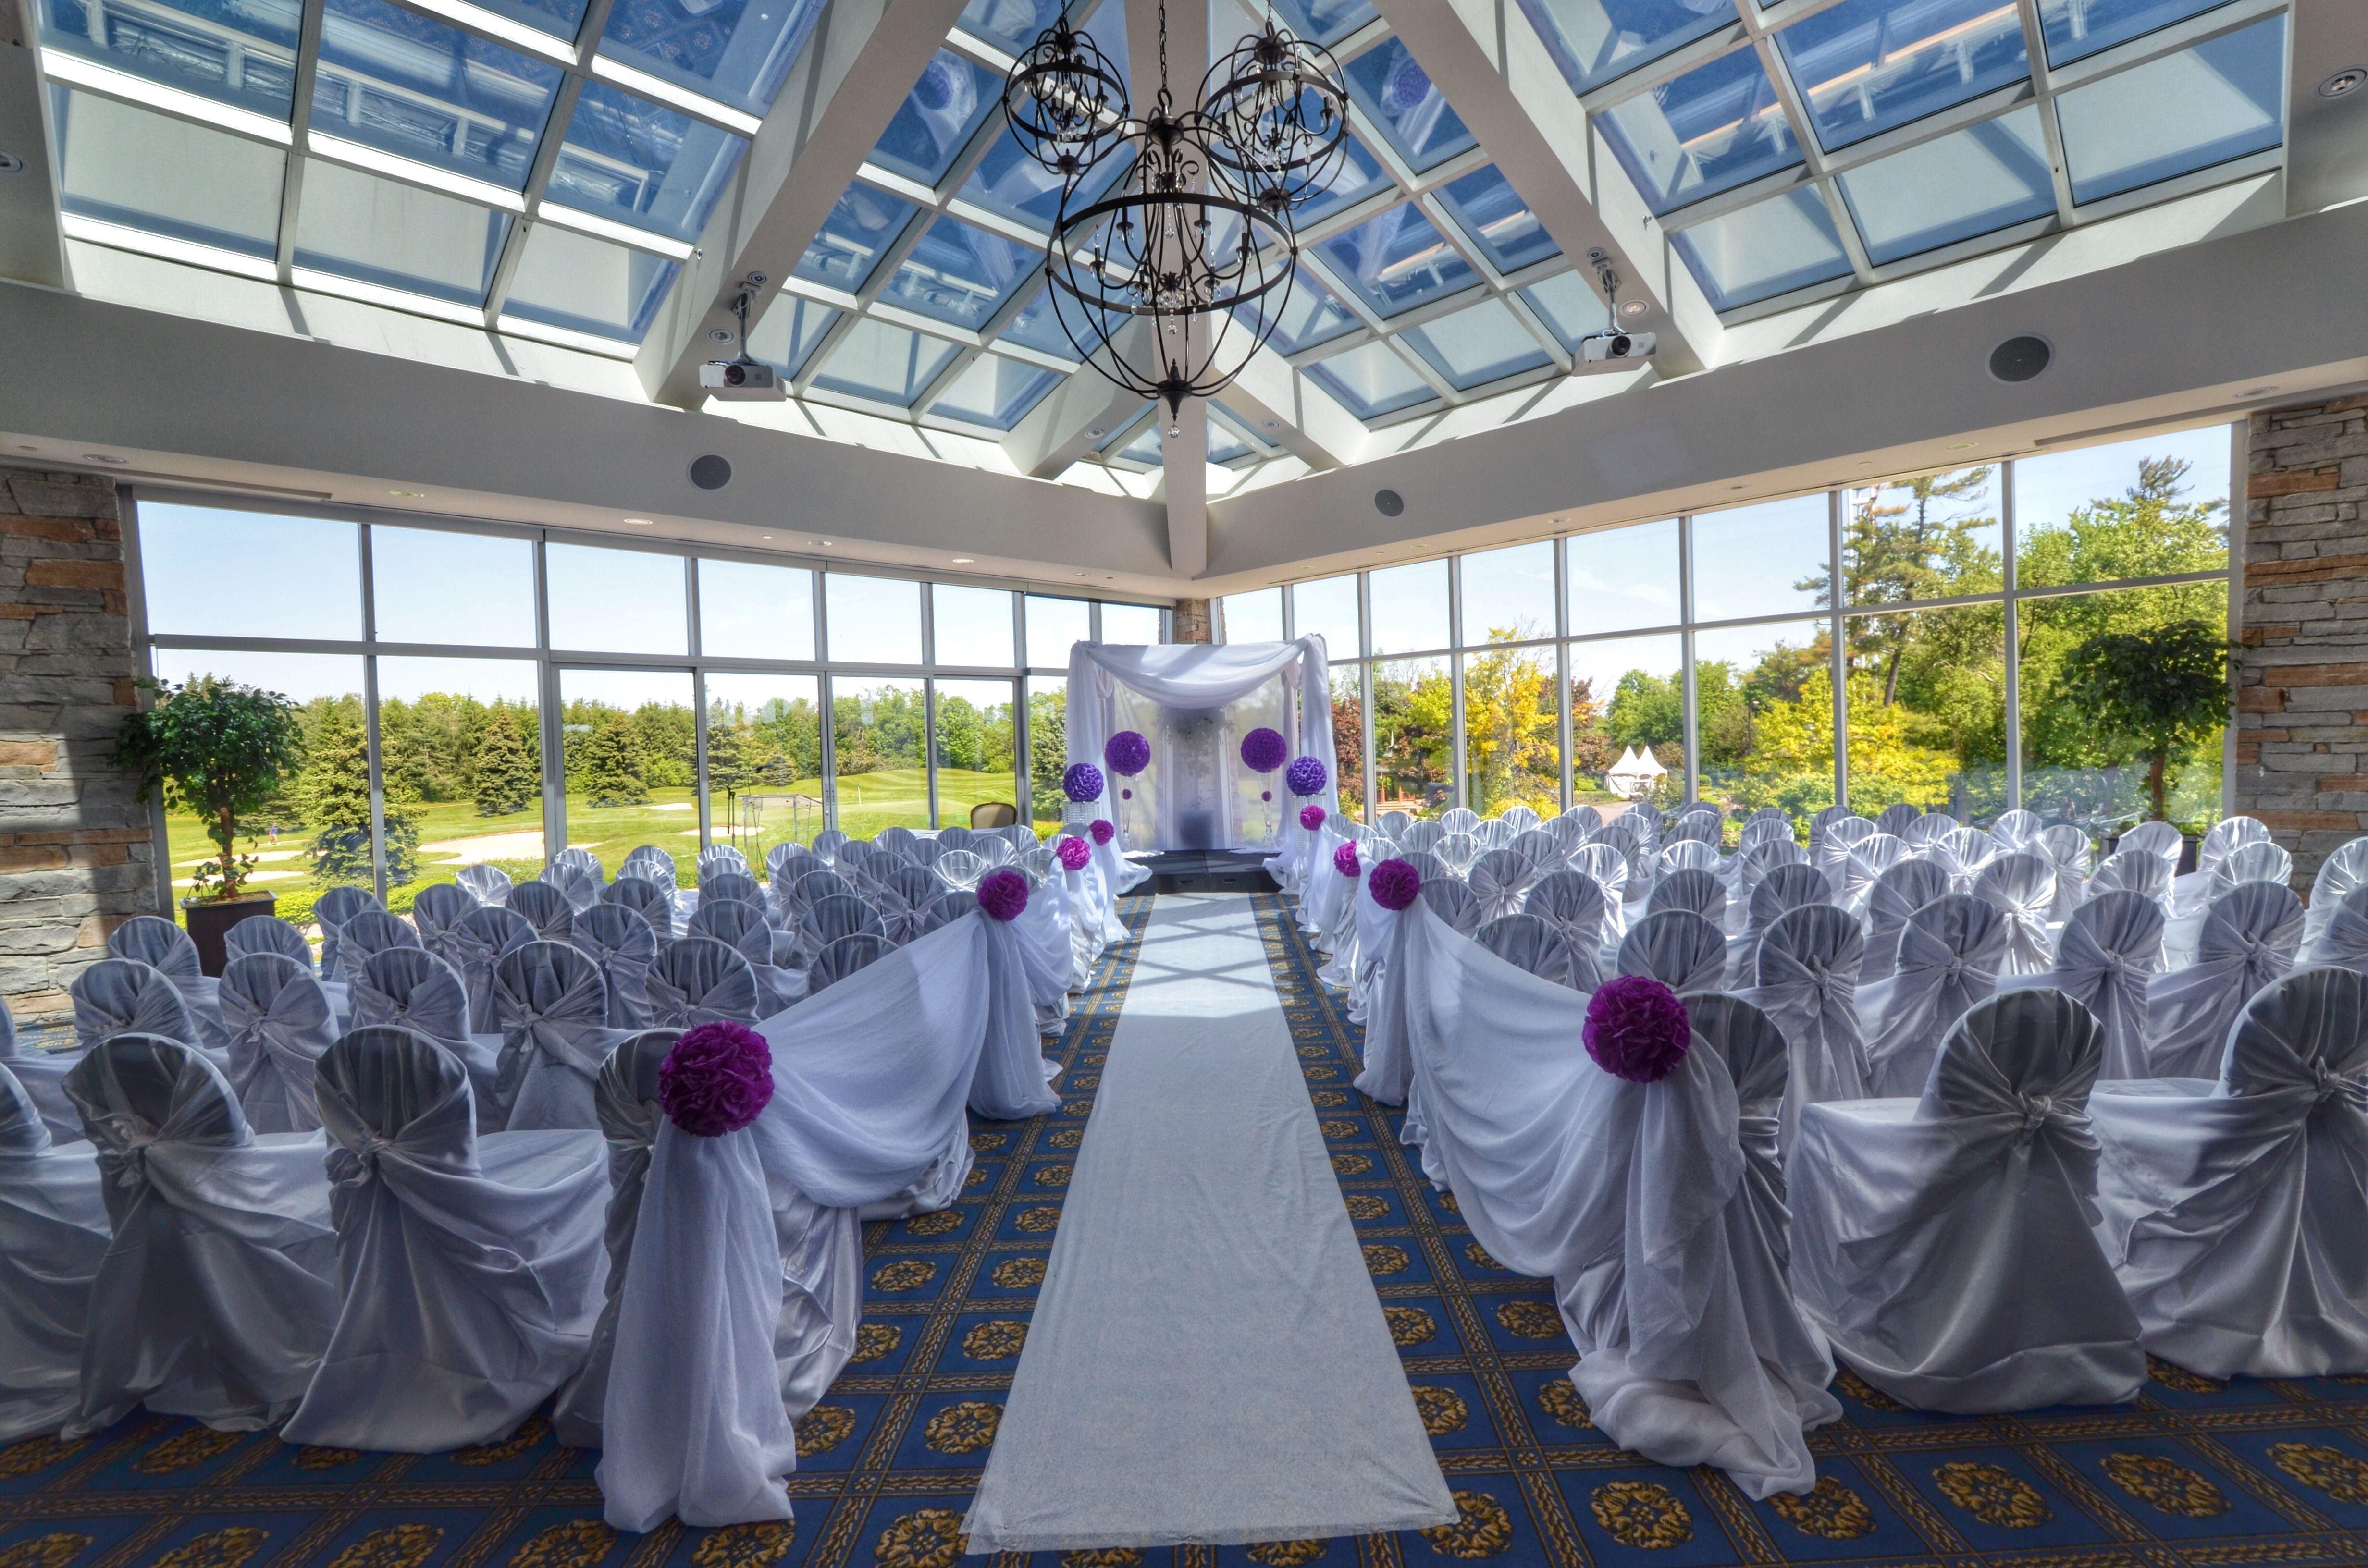 Wedding Ceremony Aberdeen Terrace Lionhead Golf Country Club Wedding Ceremony Bride Golf Golf Country Clubs Wedding Backdrop Event Organization